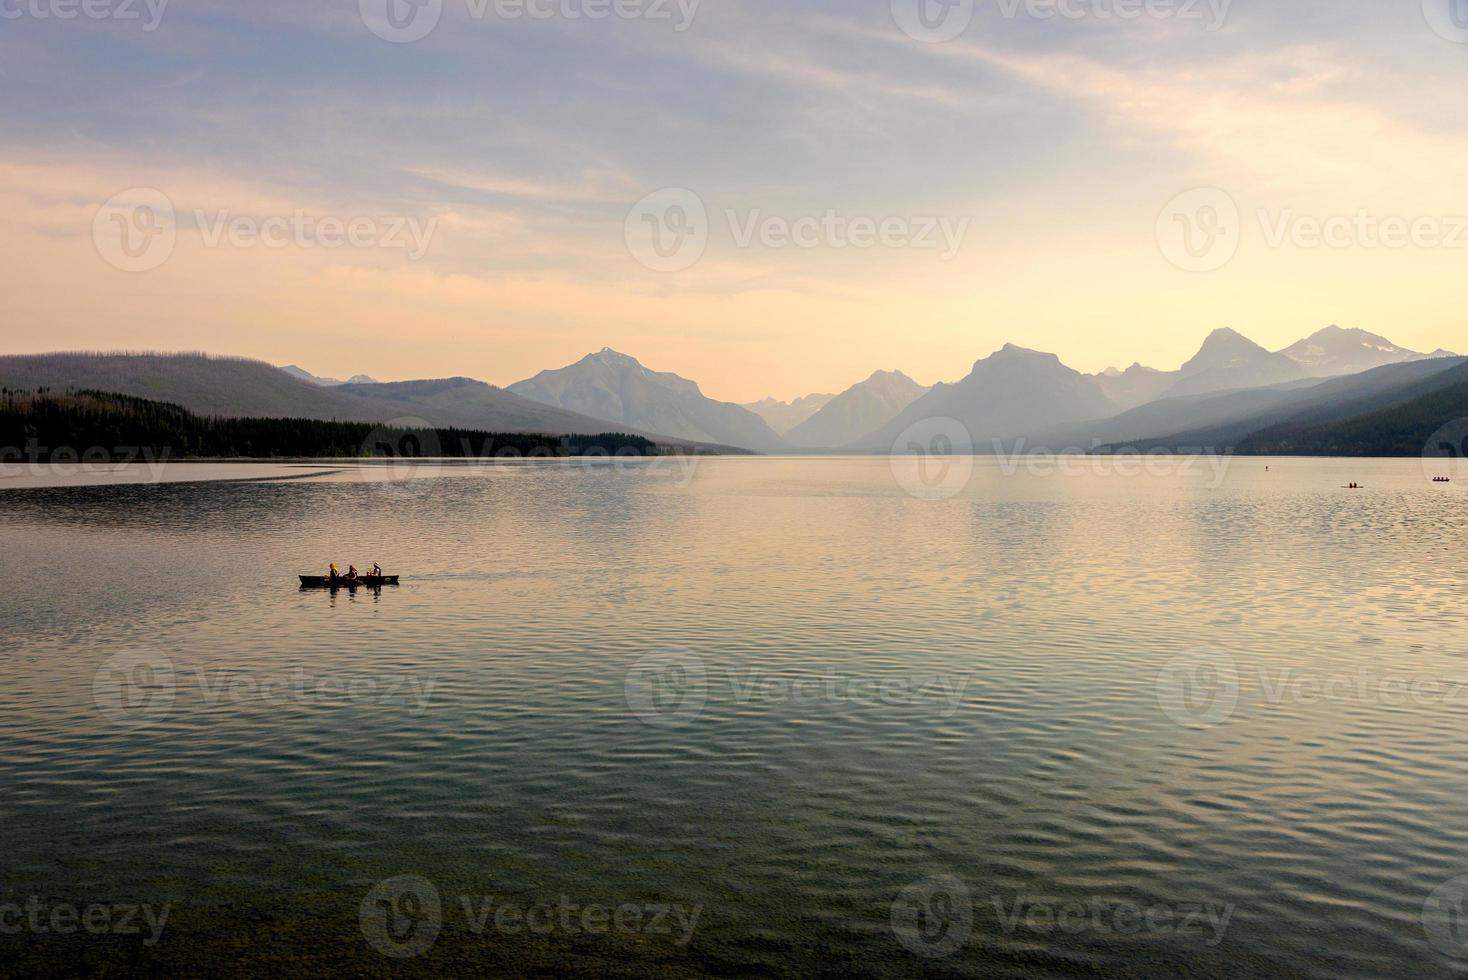 lago mcdonald ao pôr do sol foto